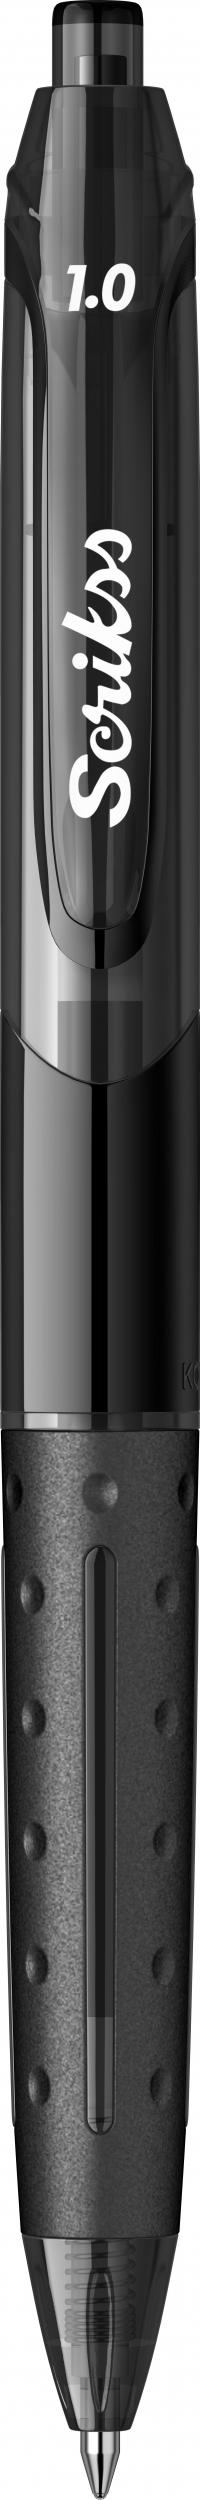 Гел химикалка Scrikss 1.0, модел 53413, Хубрид Черно